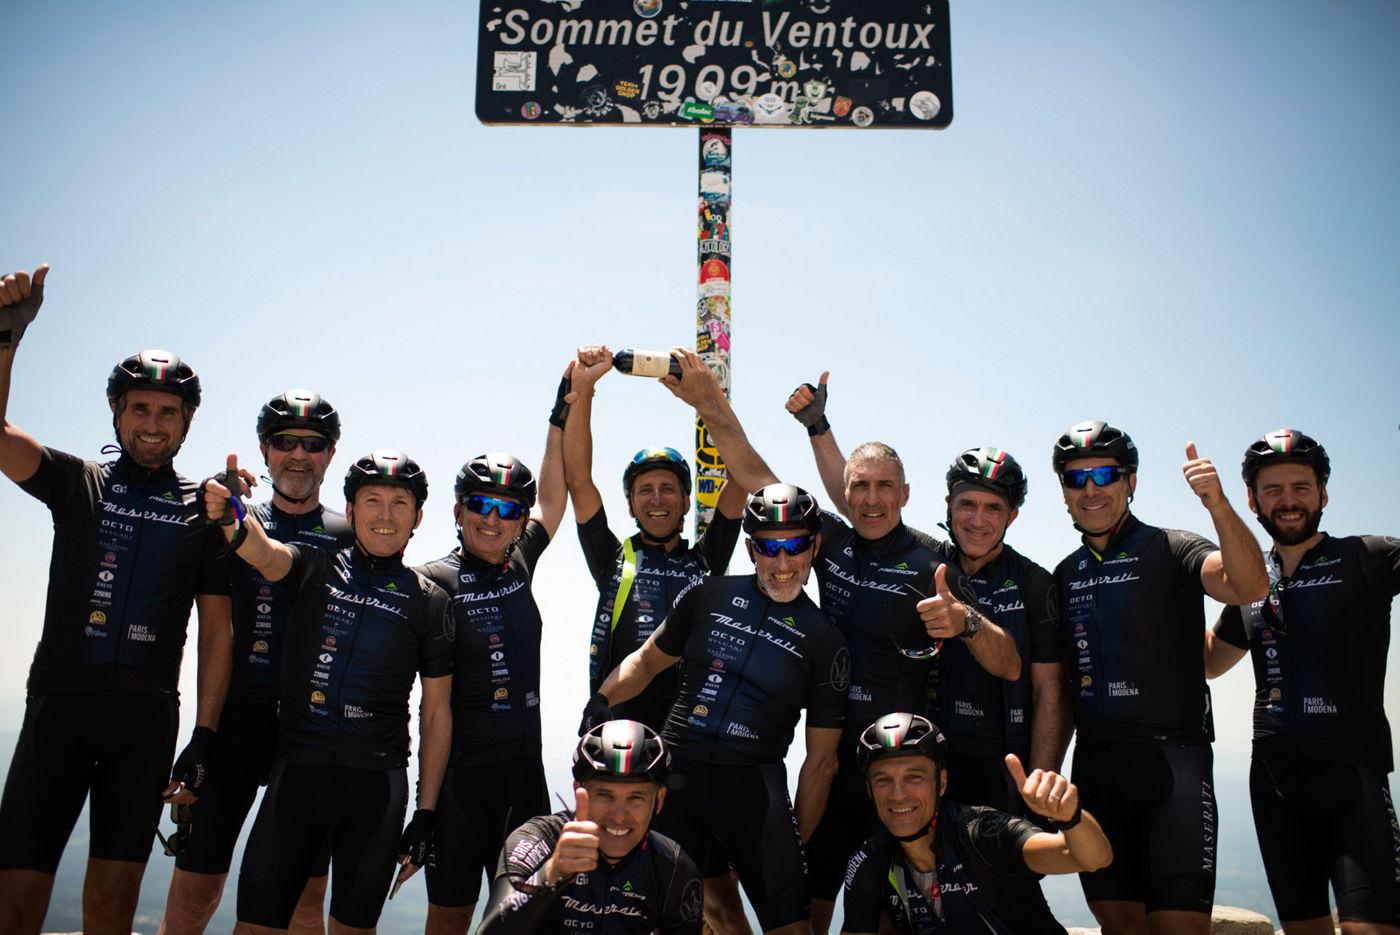 Paris Modena Radtour 2019 - Mont Ventoux